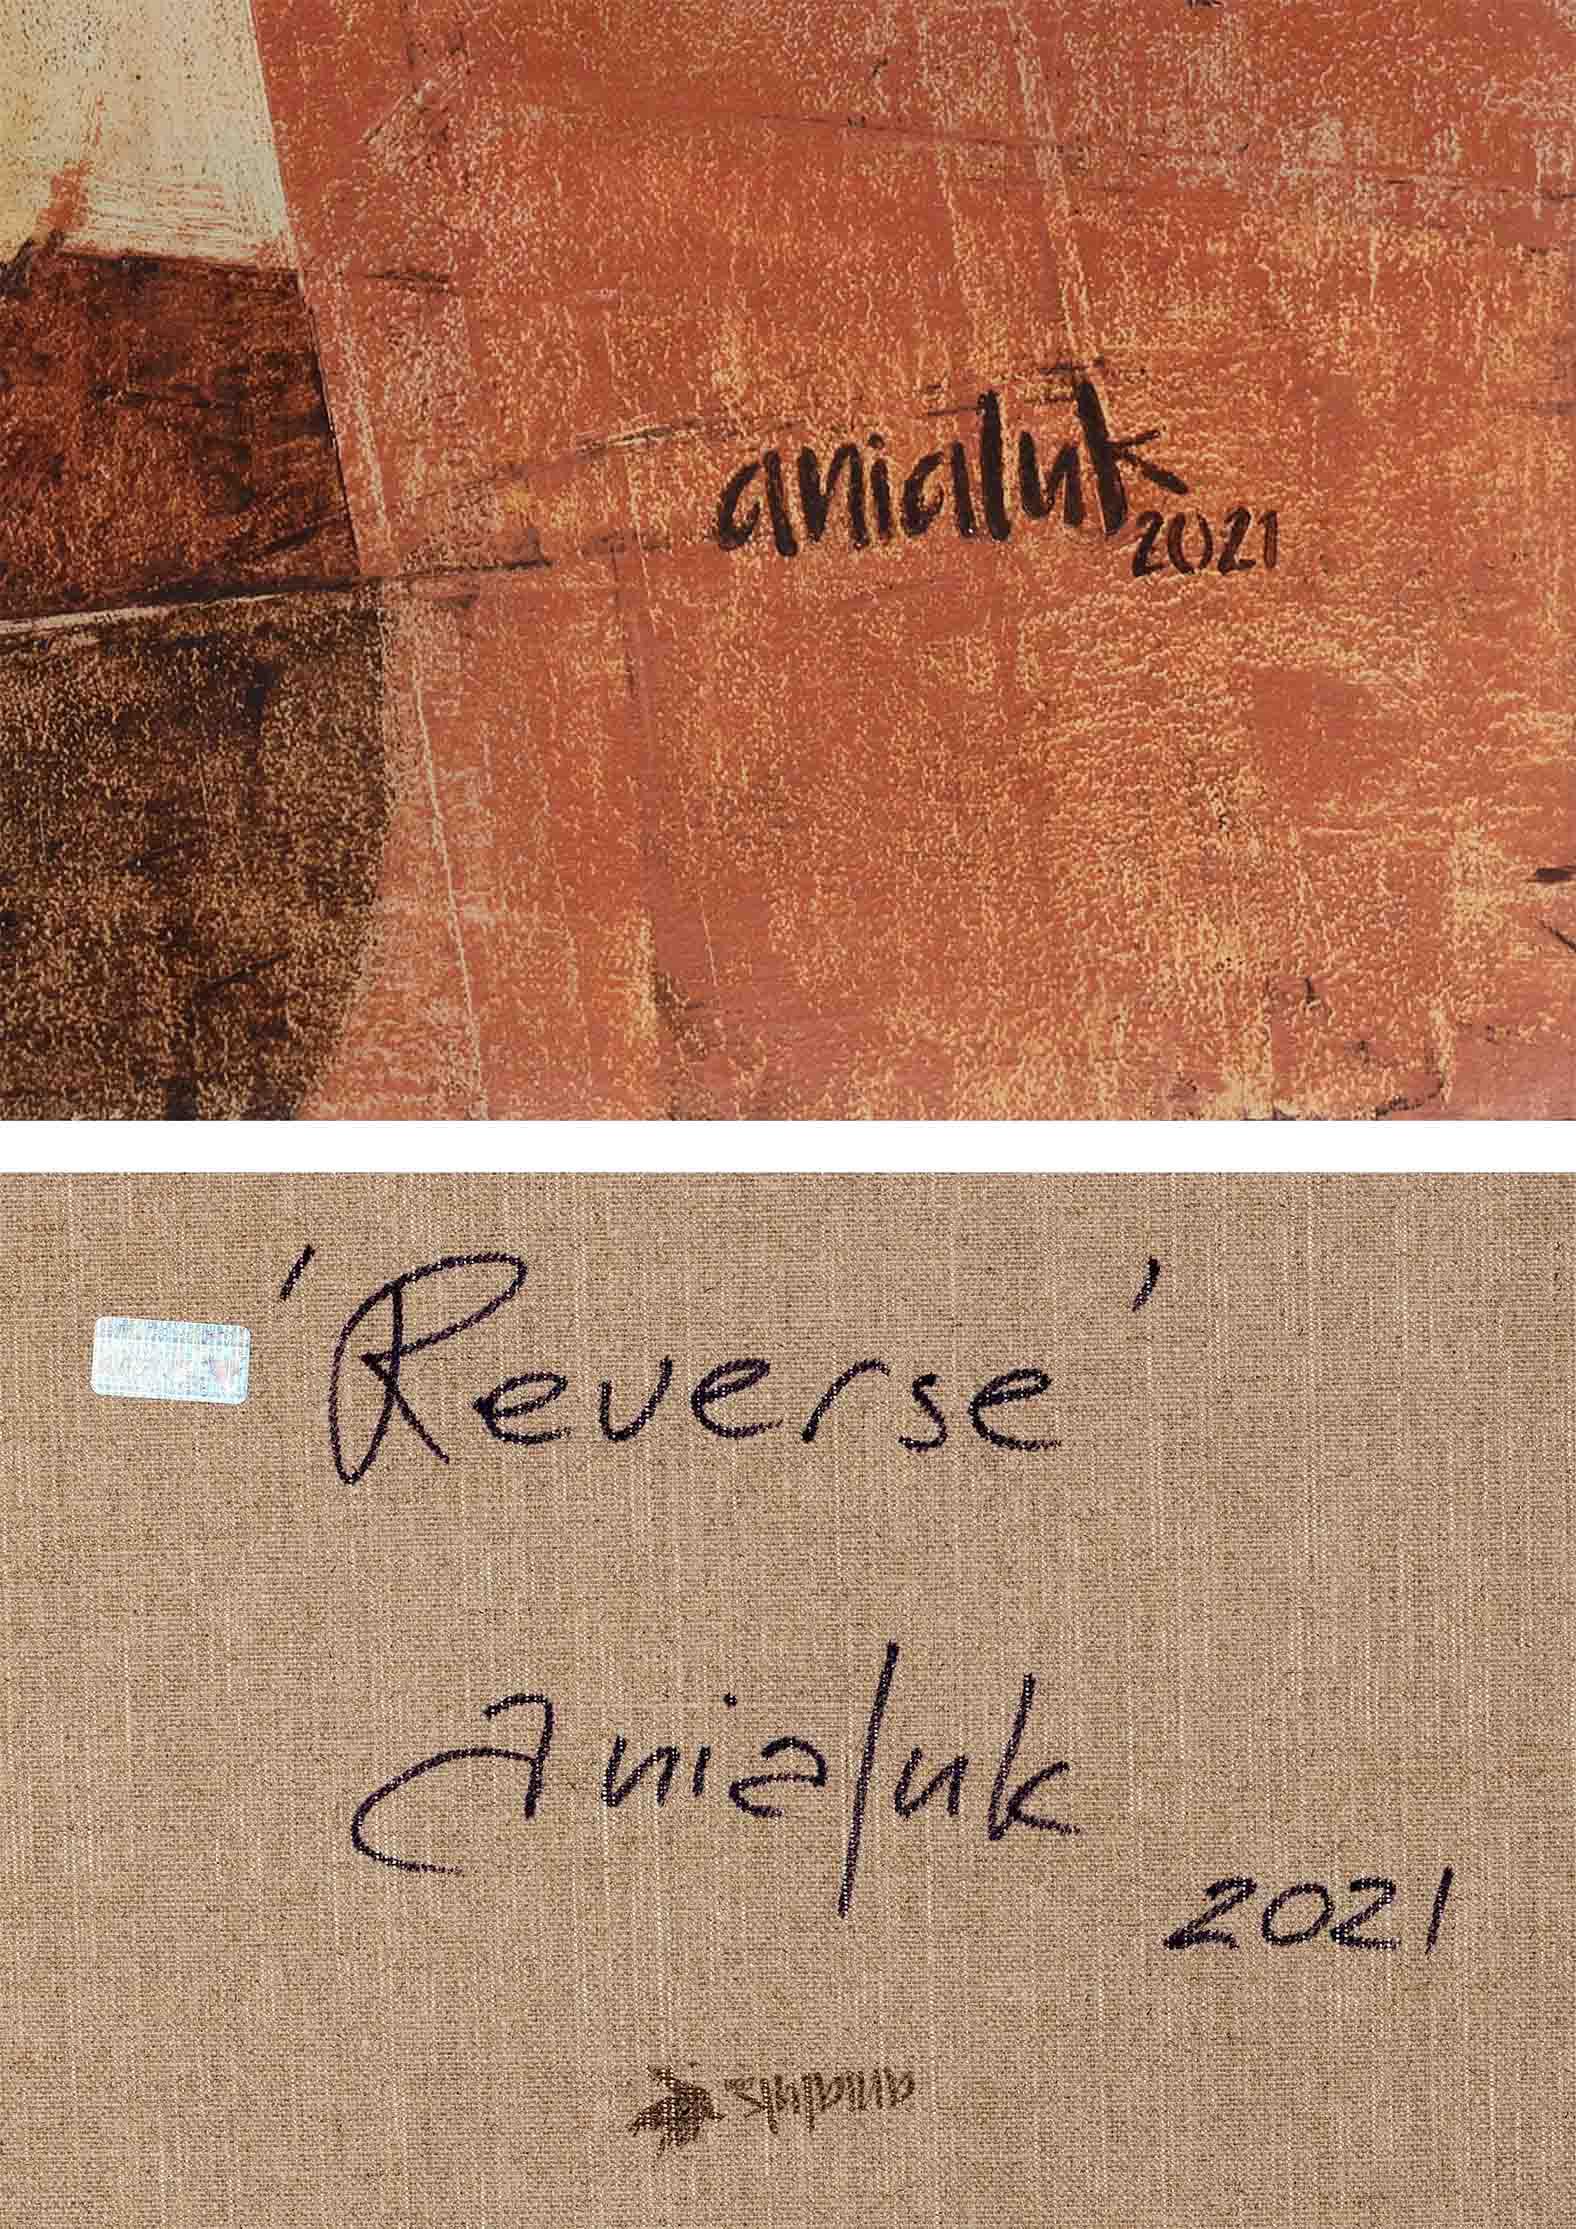 Reverse signature and stamp